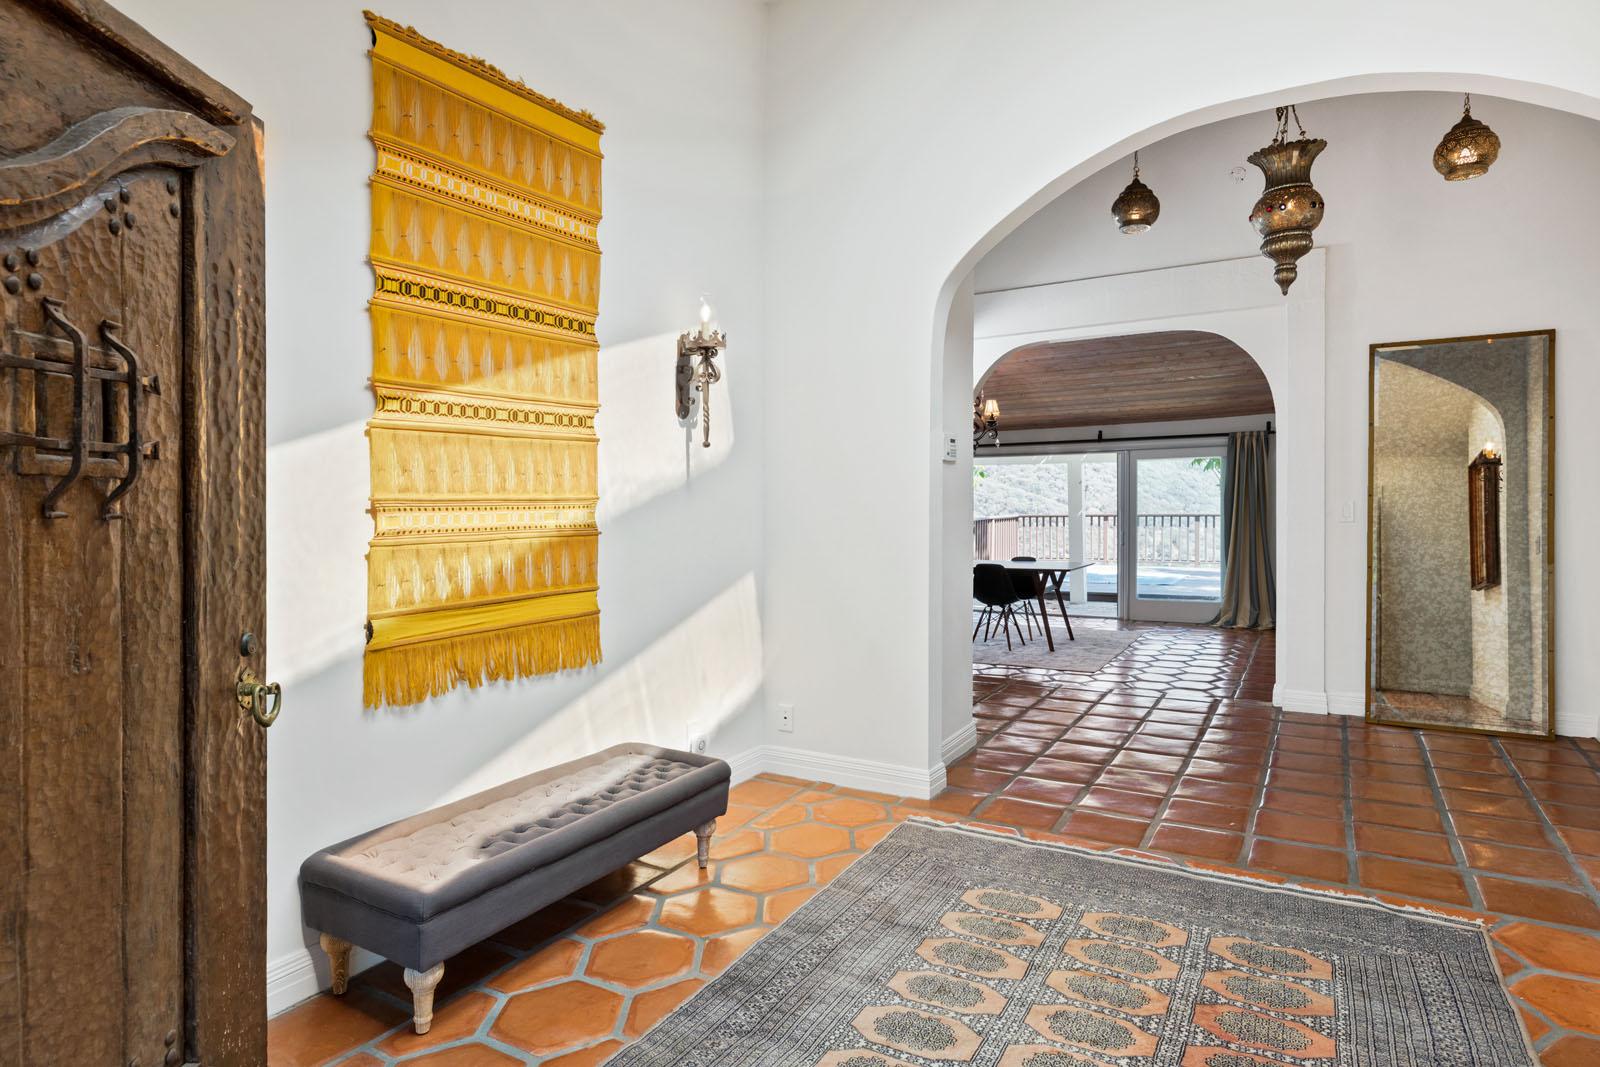 002 Entry 1712 Manzanita Park Avenue Malibu For Sale Lease The Malibu Life Team Luxury Real Estate.jpg